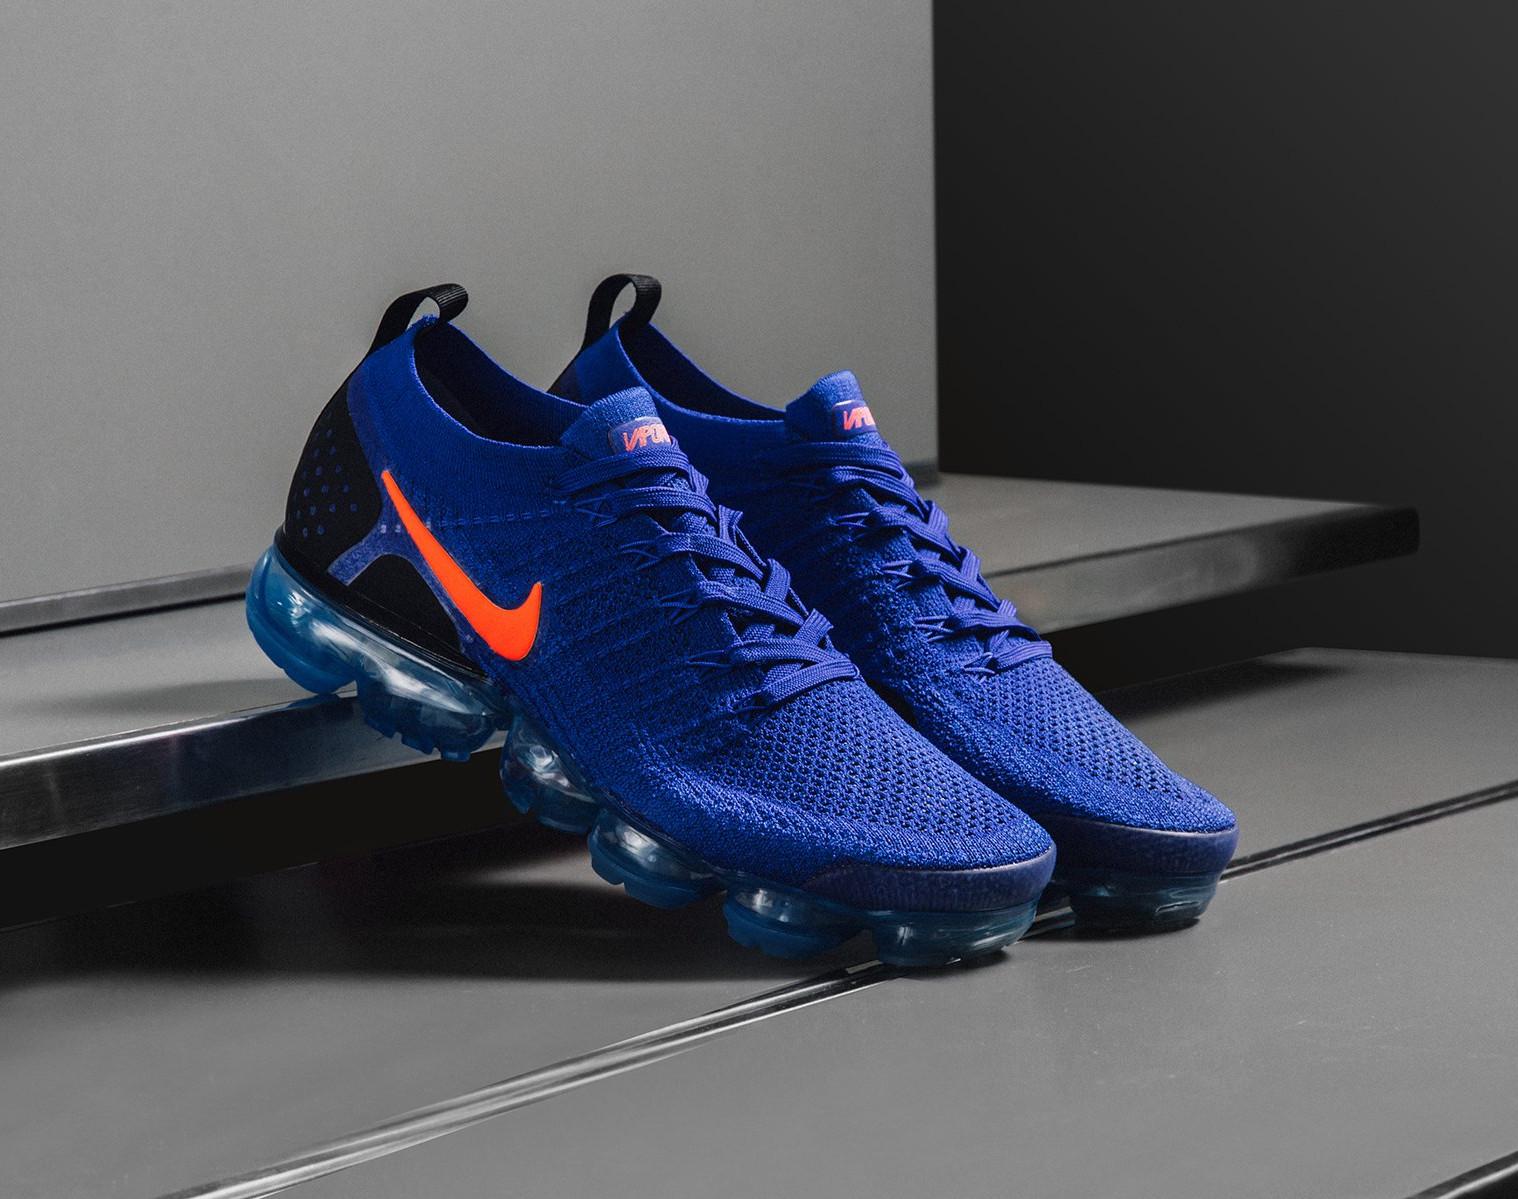 chaussure-nike-air-vapormax-2-tissage-bleu-foncé-swoosh-orange (4)